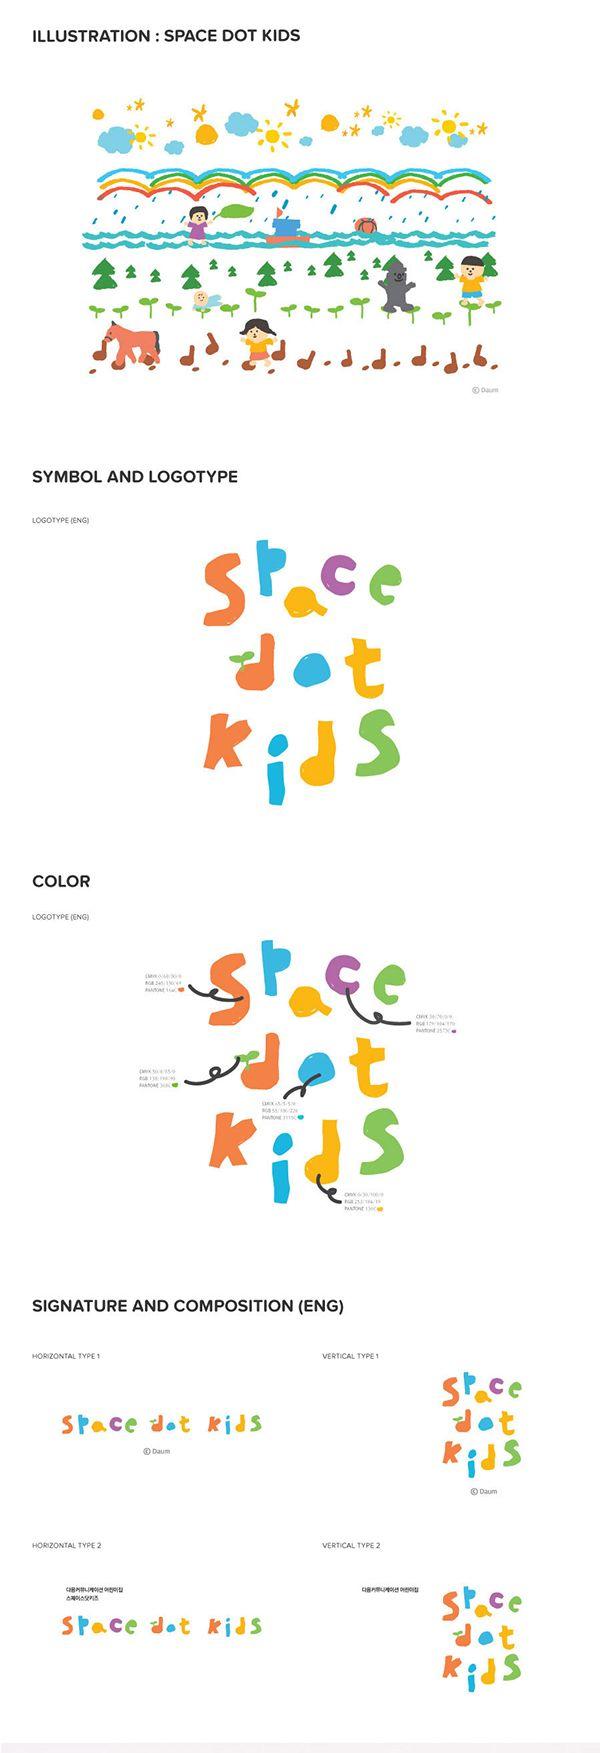 space dot kids on Behance